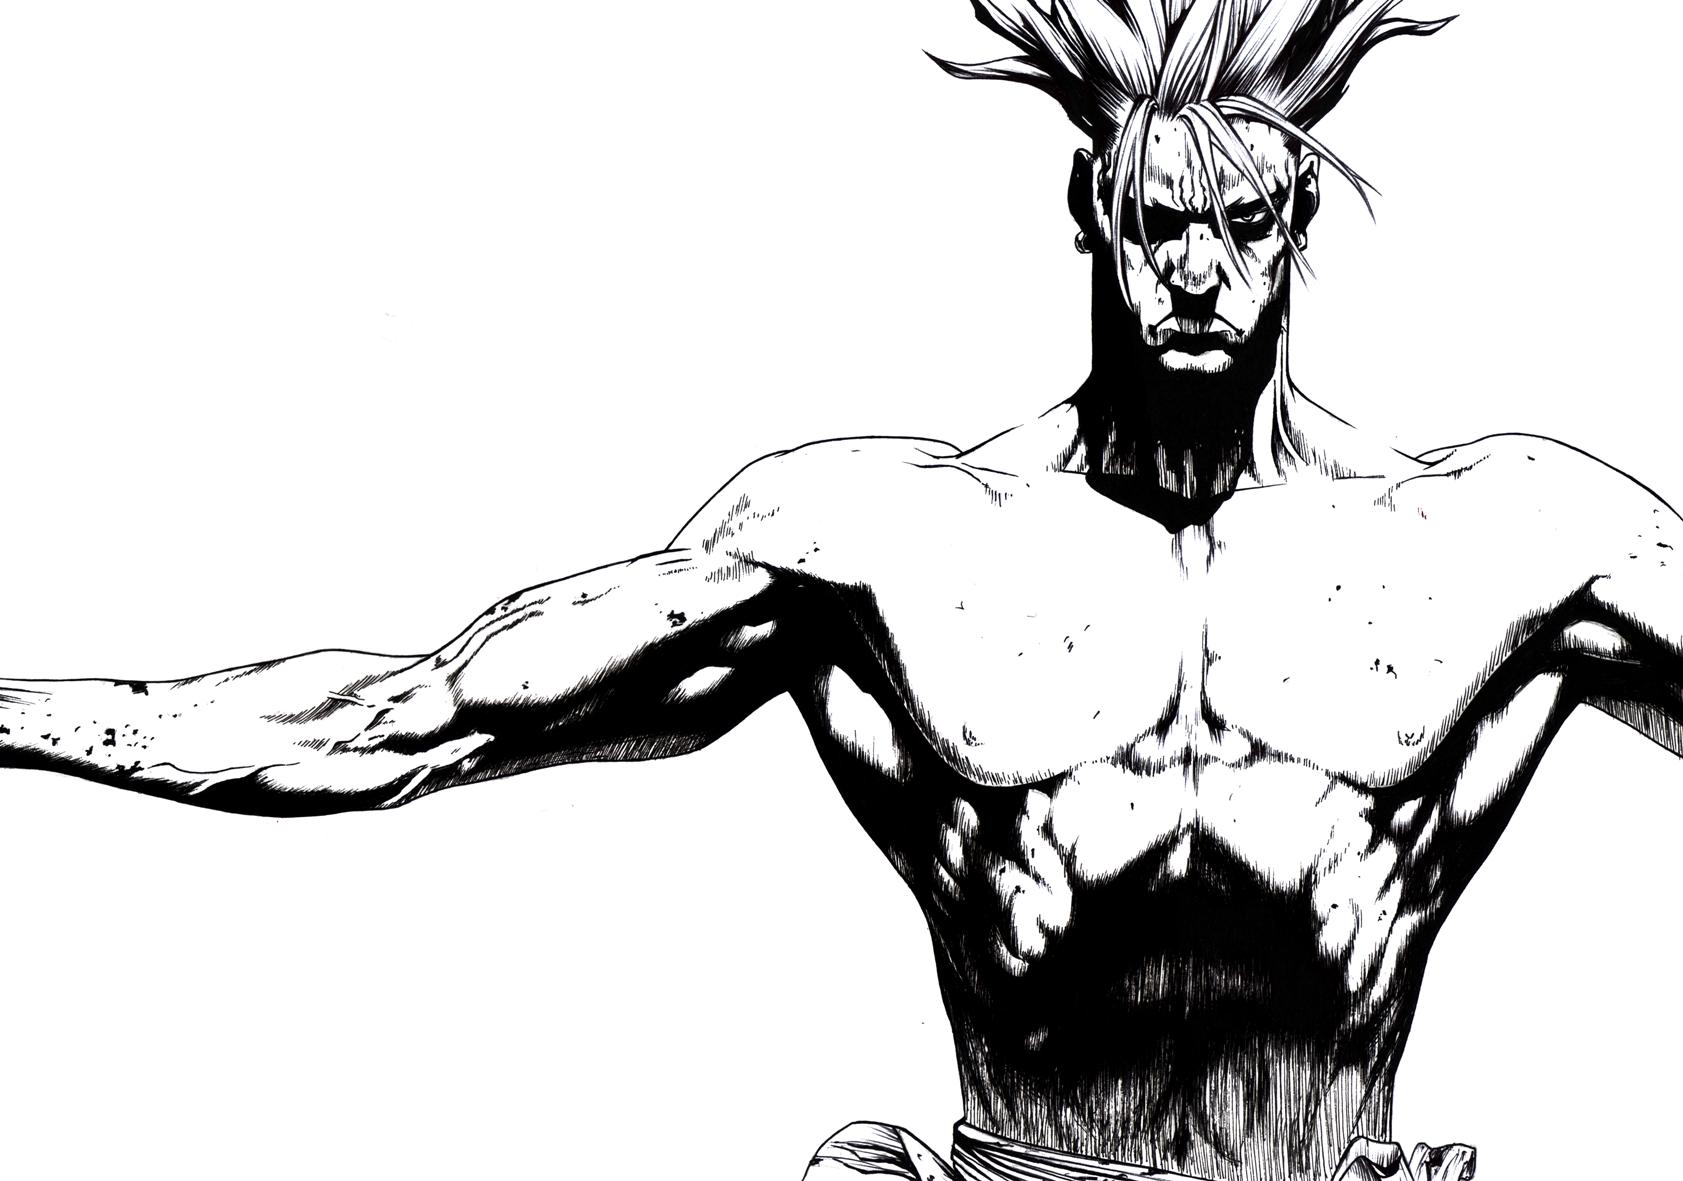 Wallpaper : Sun Ken Rock, manga 1683x1181 - mbourrig - 1390271 - HD ...